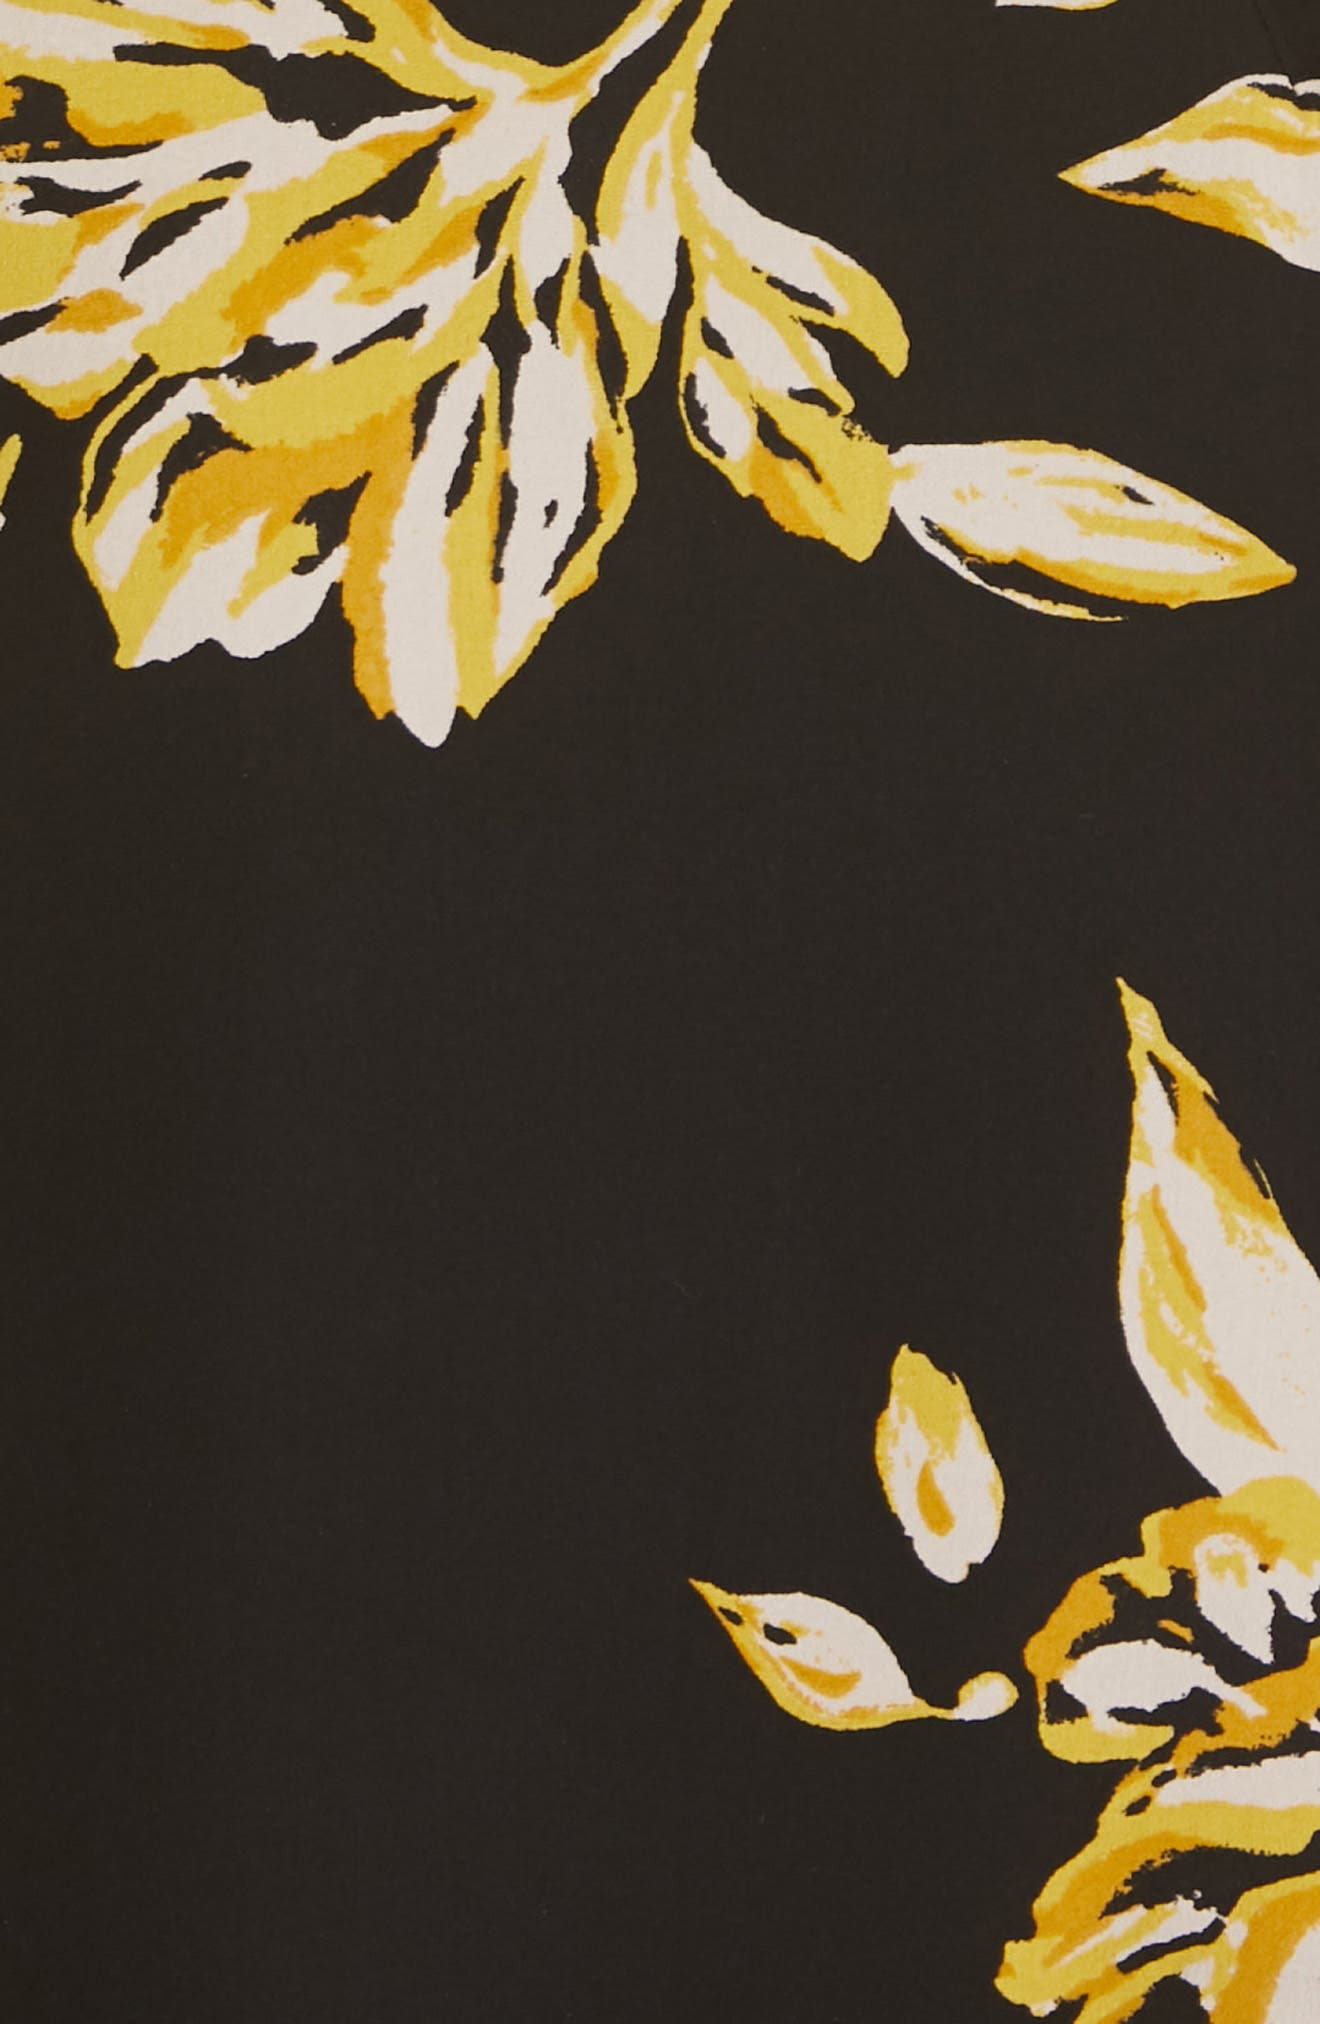 Gyan Floral Silk Dress,                             Alternate thumbnail 6, color,                             CAVIAR